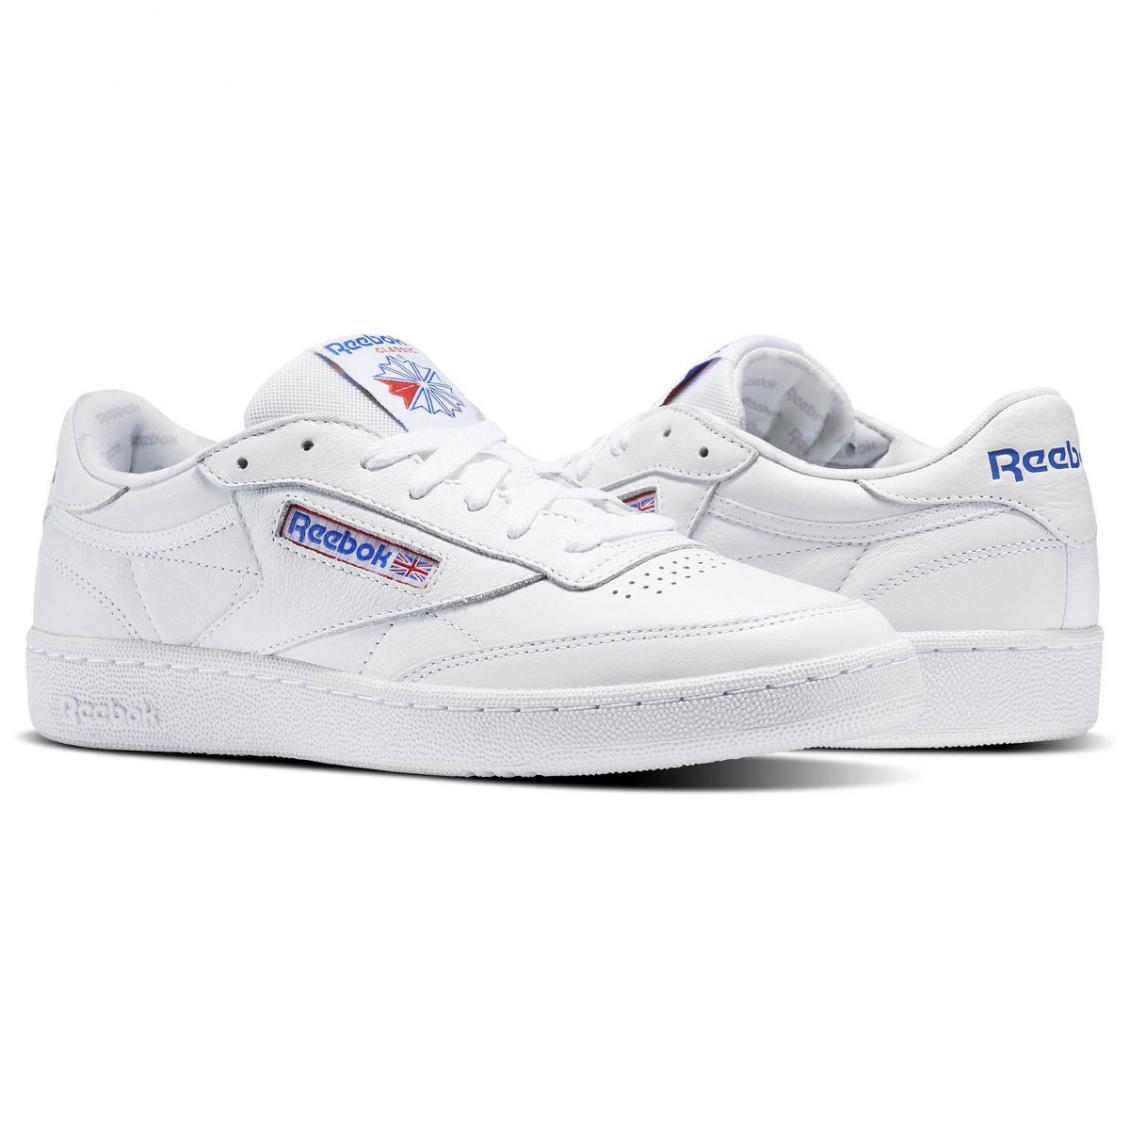 White – Reebok Club C 85 SO Mens White Light Grey Heather